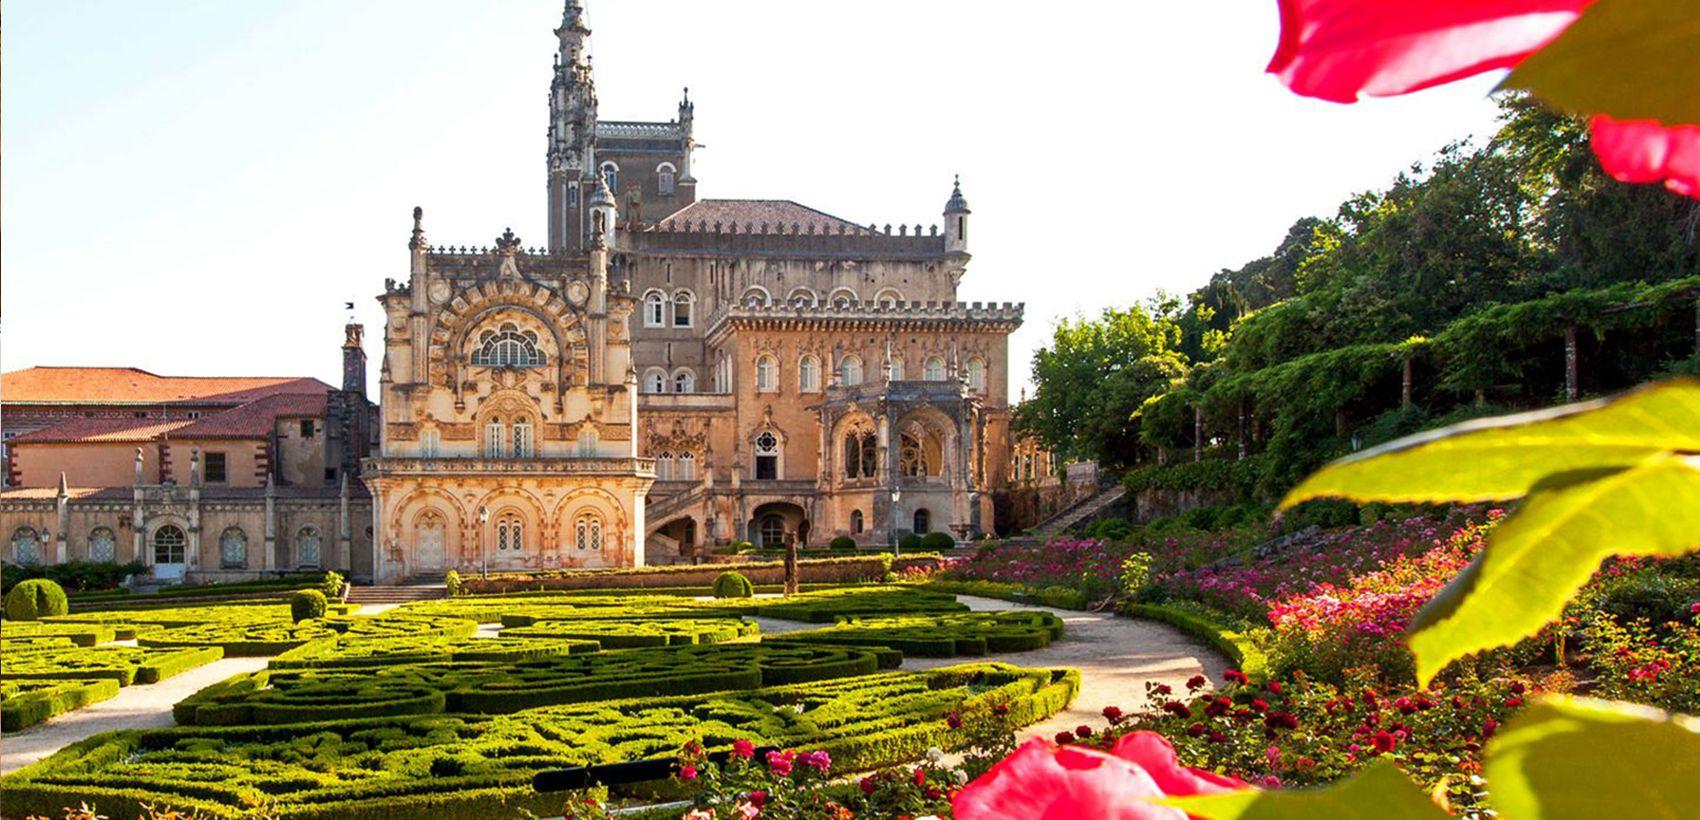 Durma num Palácio | Sonhos Reais: Palace Hotel do Bussaco